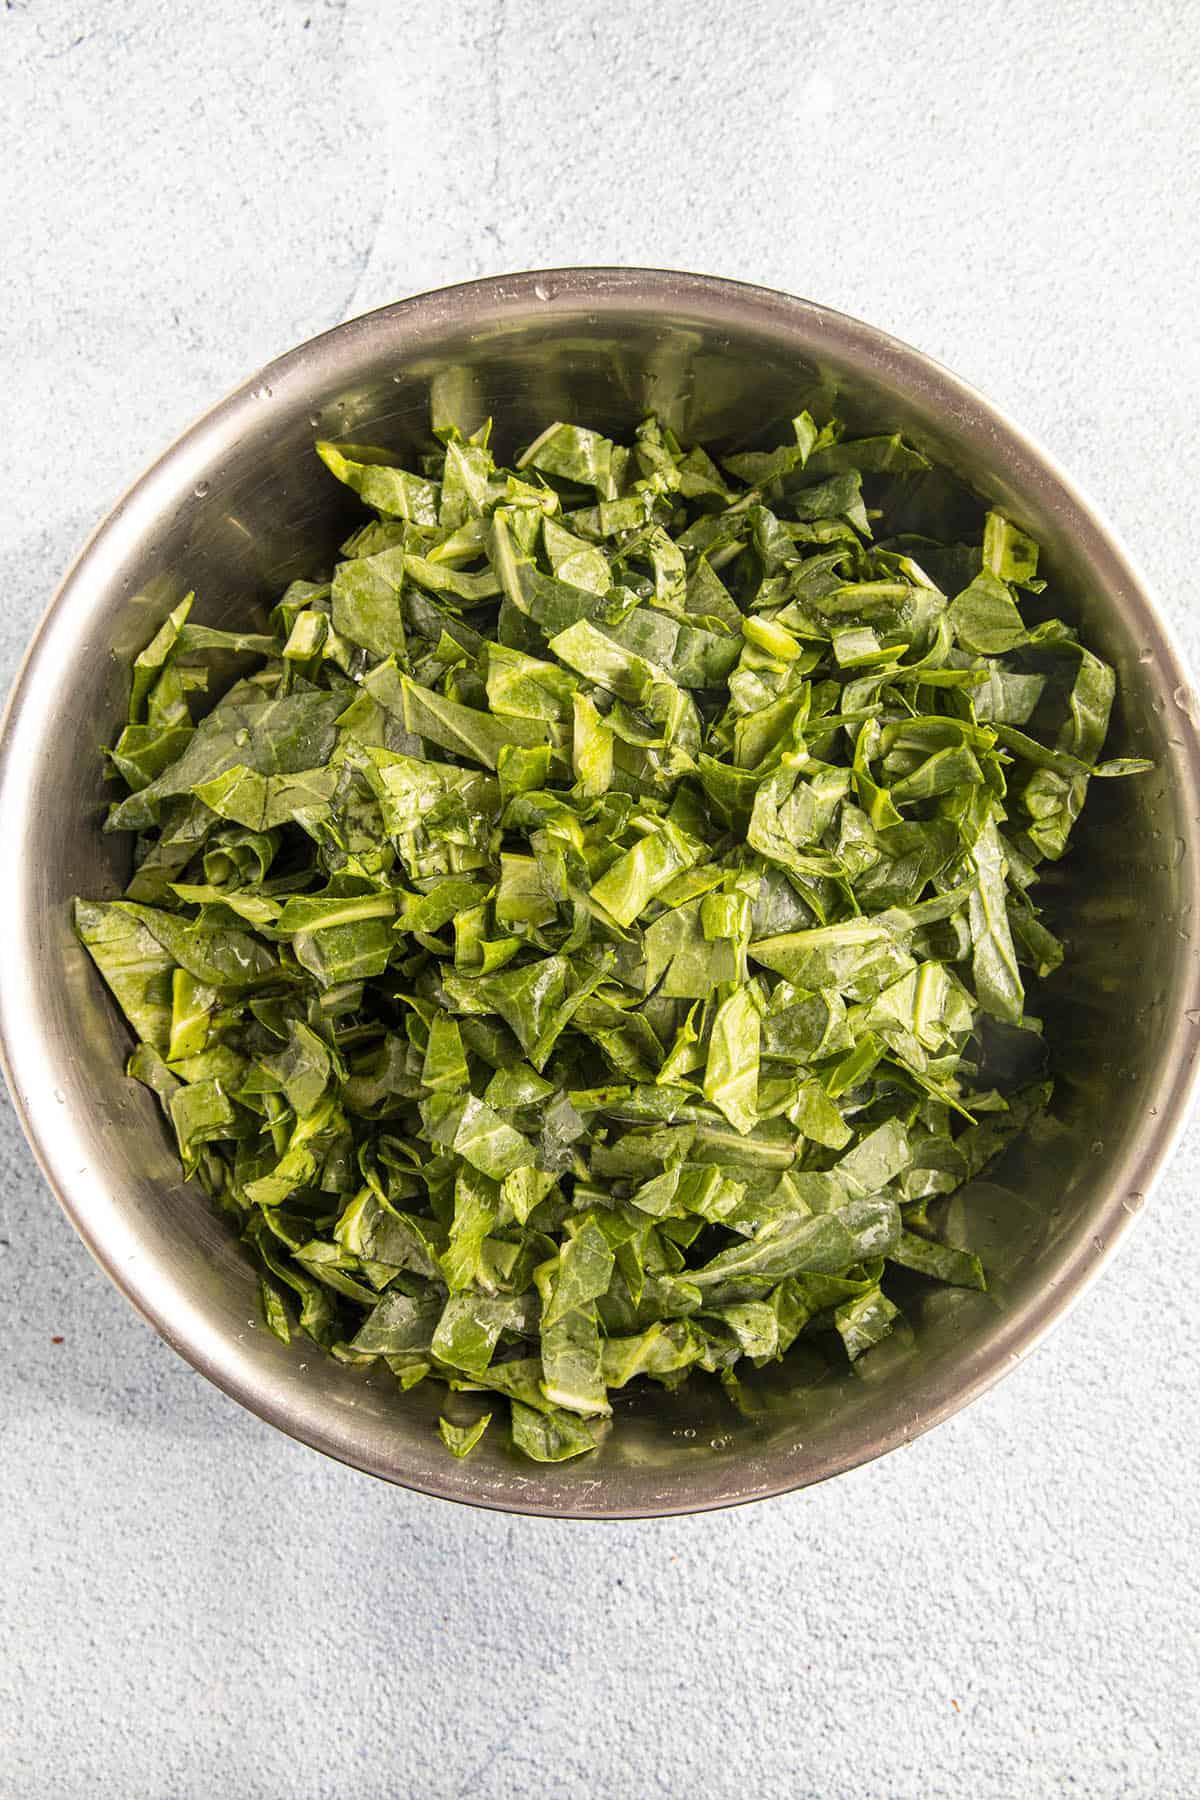 Rinsed Collard Greens in a bowl